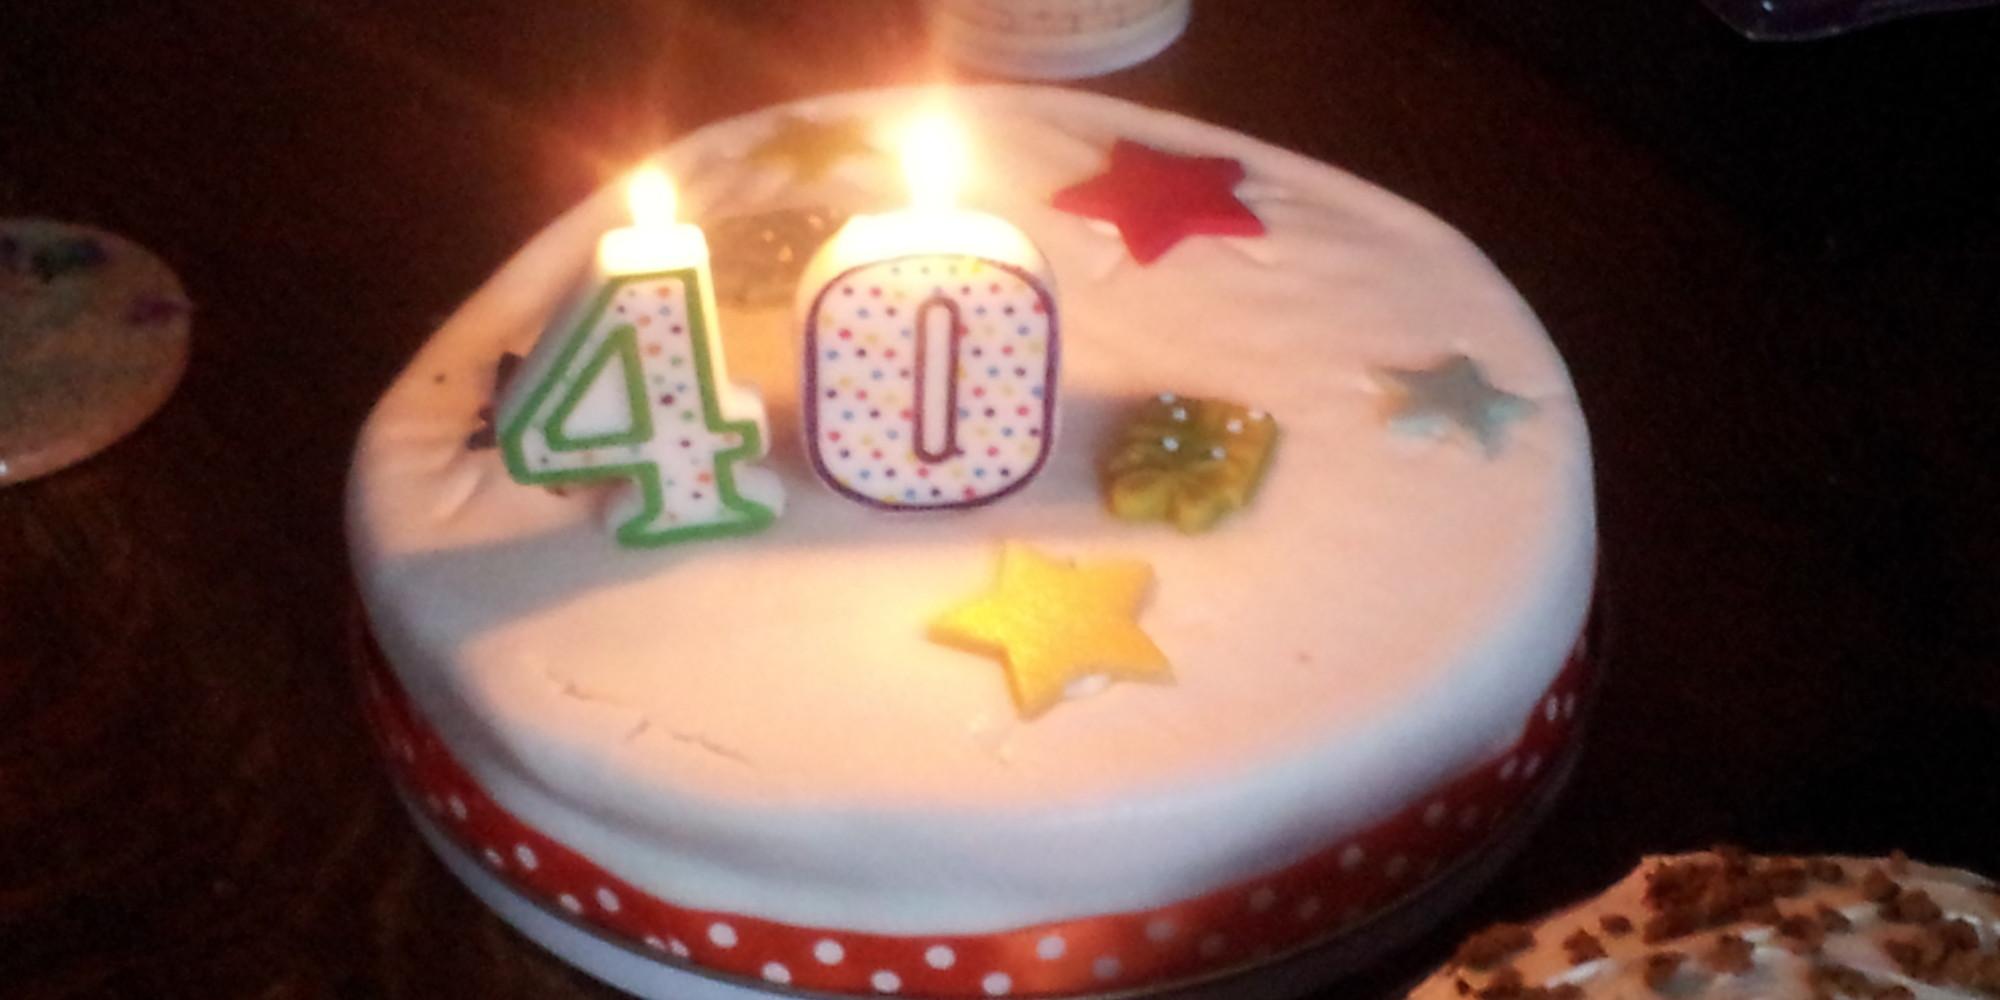 40 Year Old Woman Pretty Source Birthday Cake